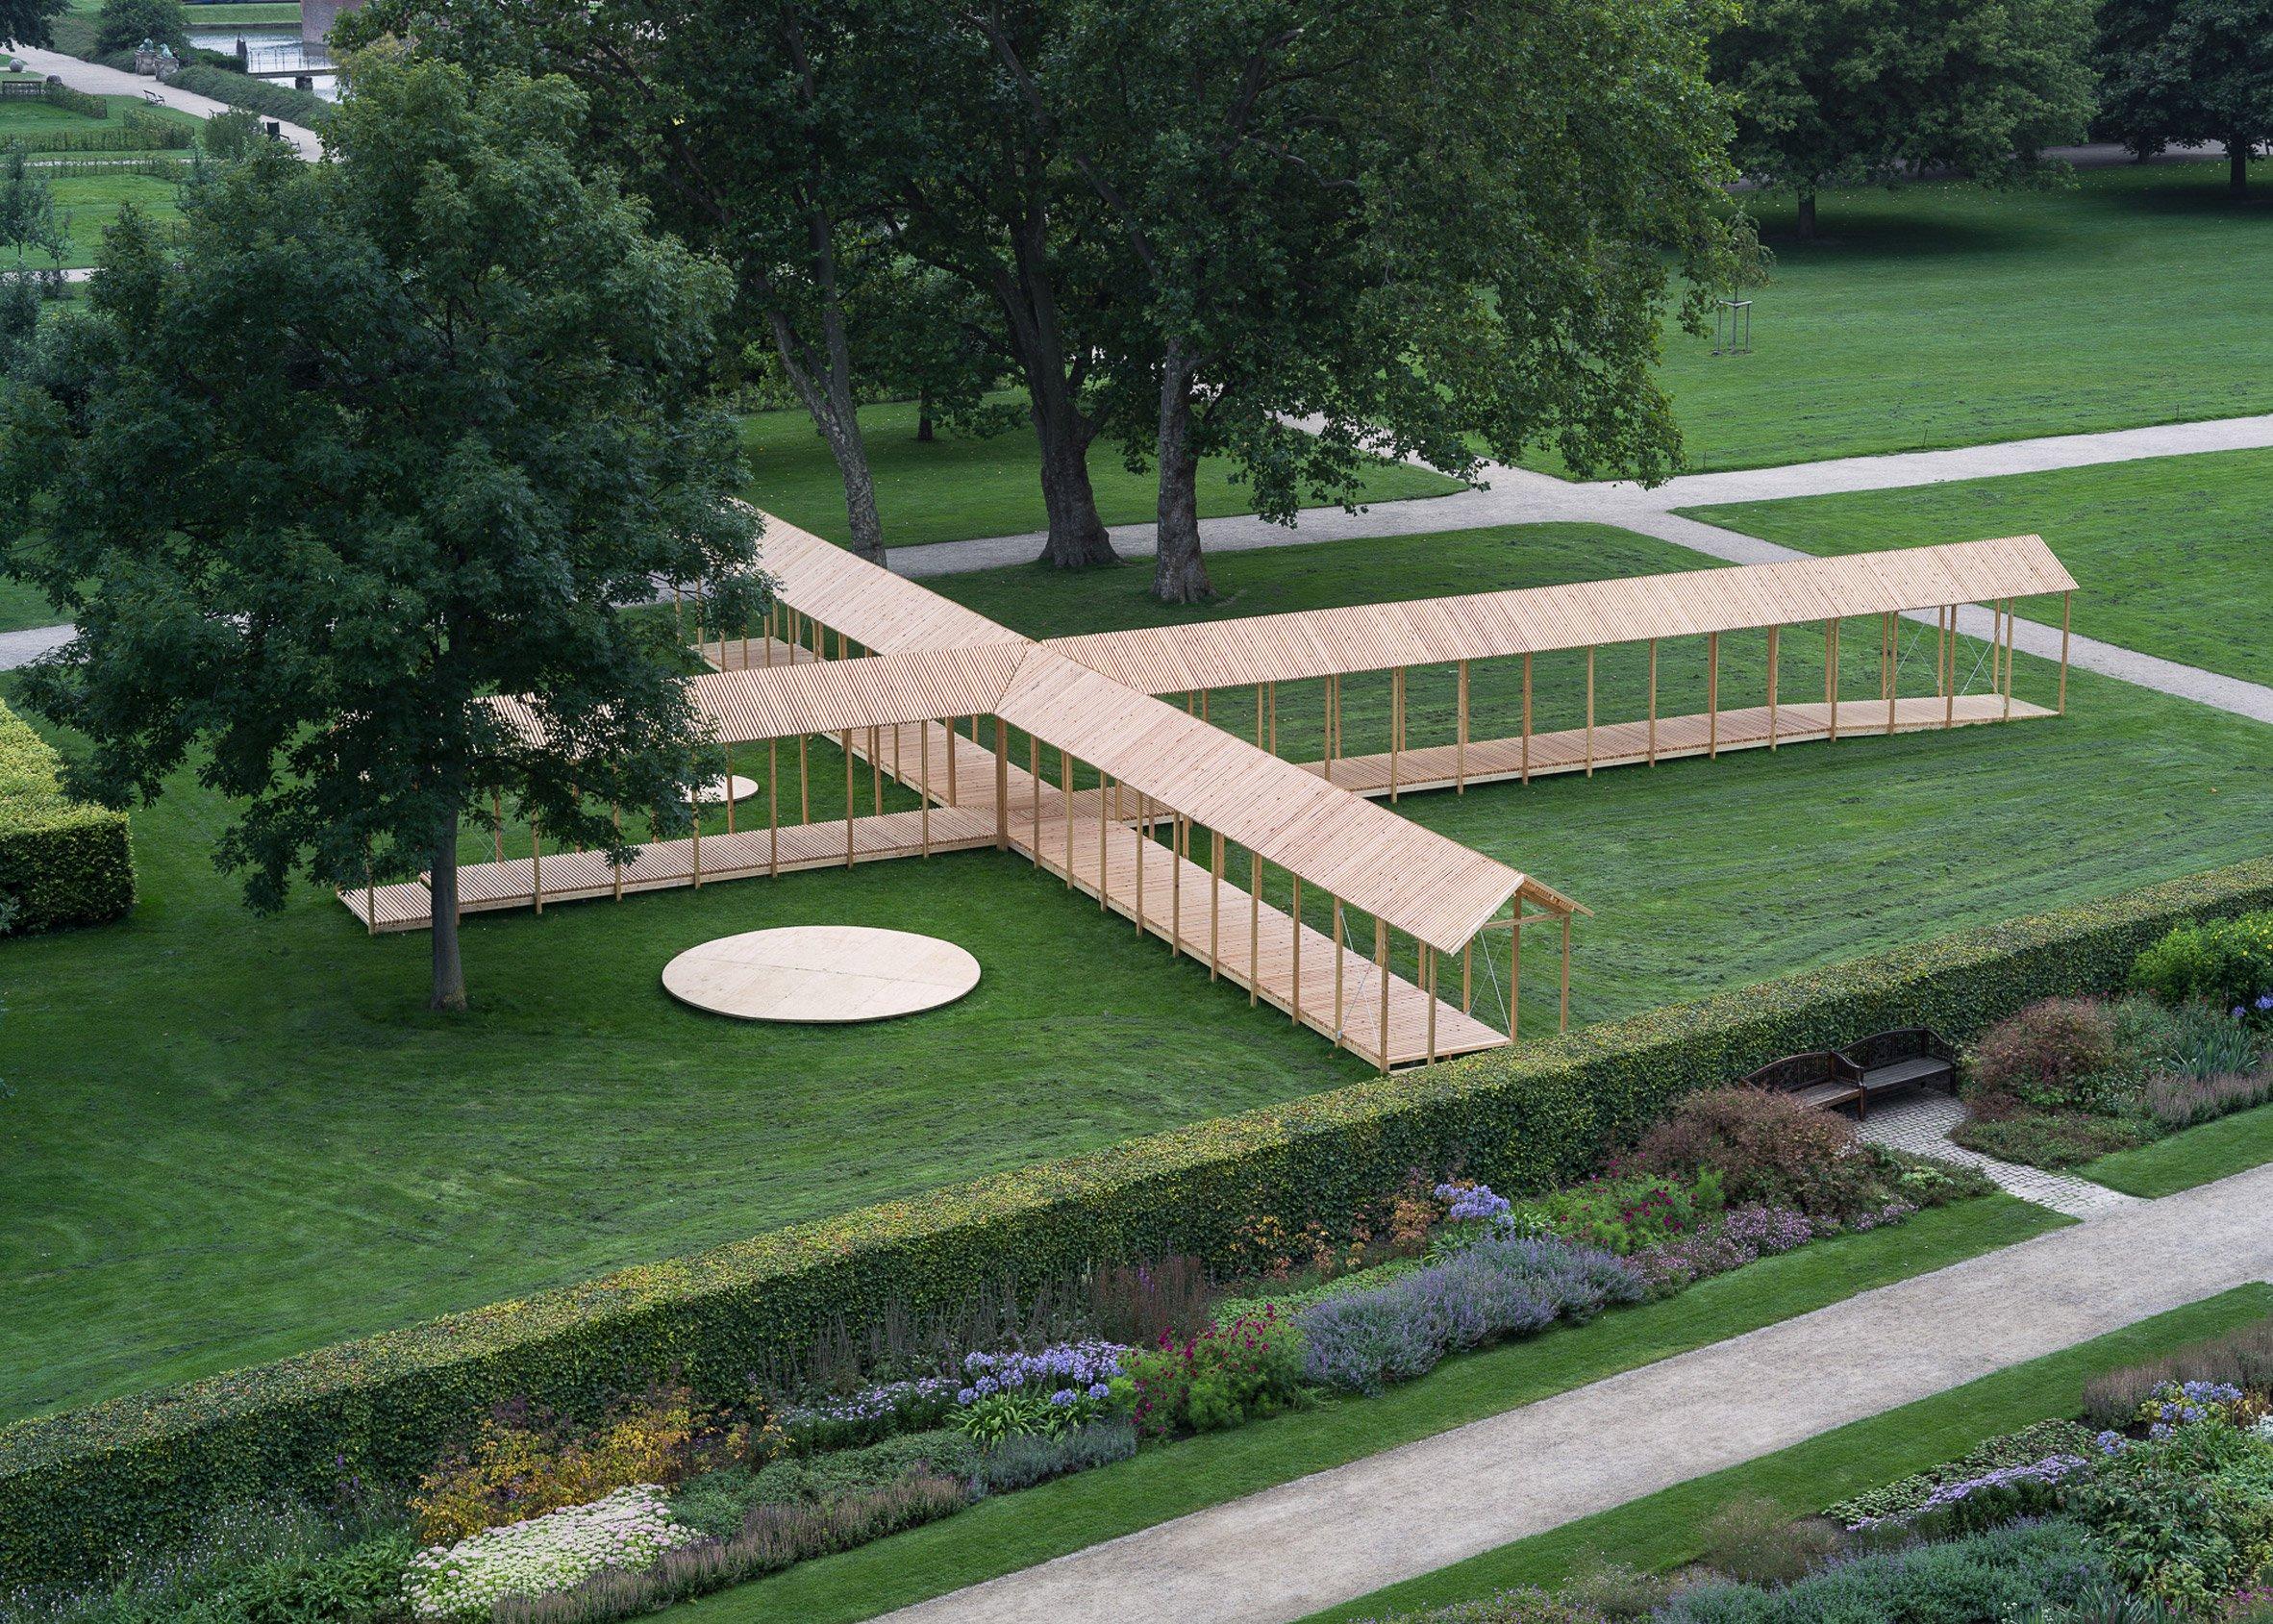 Cruciform pavilion by Krupinski/Krupinska Arkitekter references historic Copenhagen garden